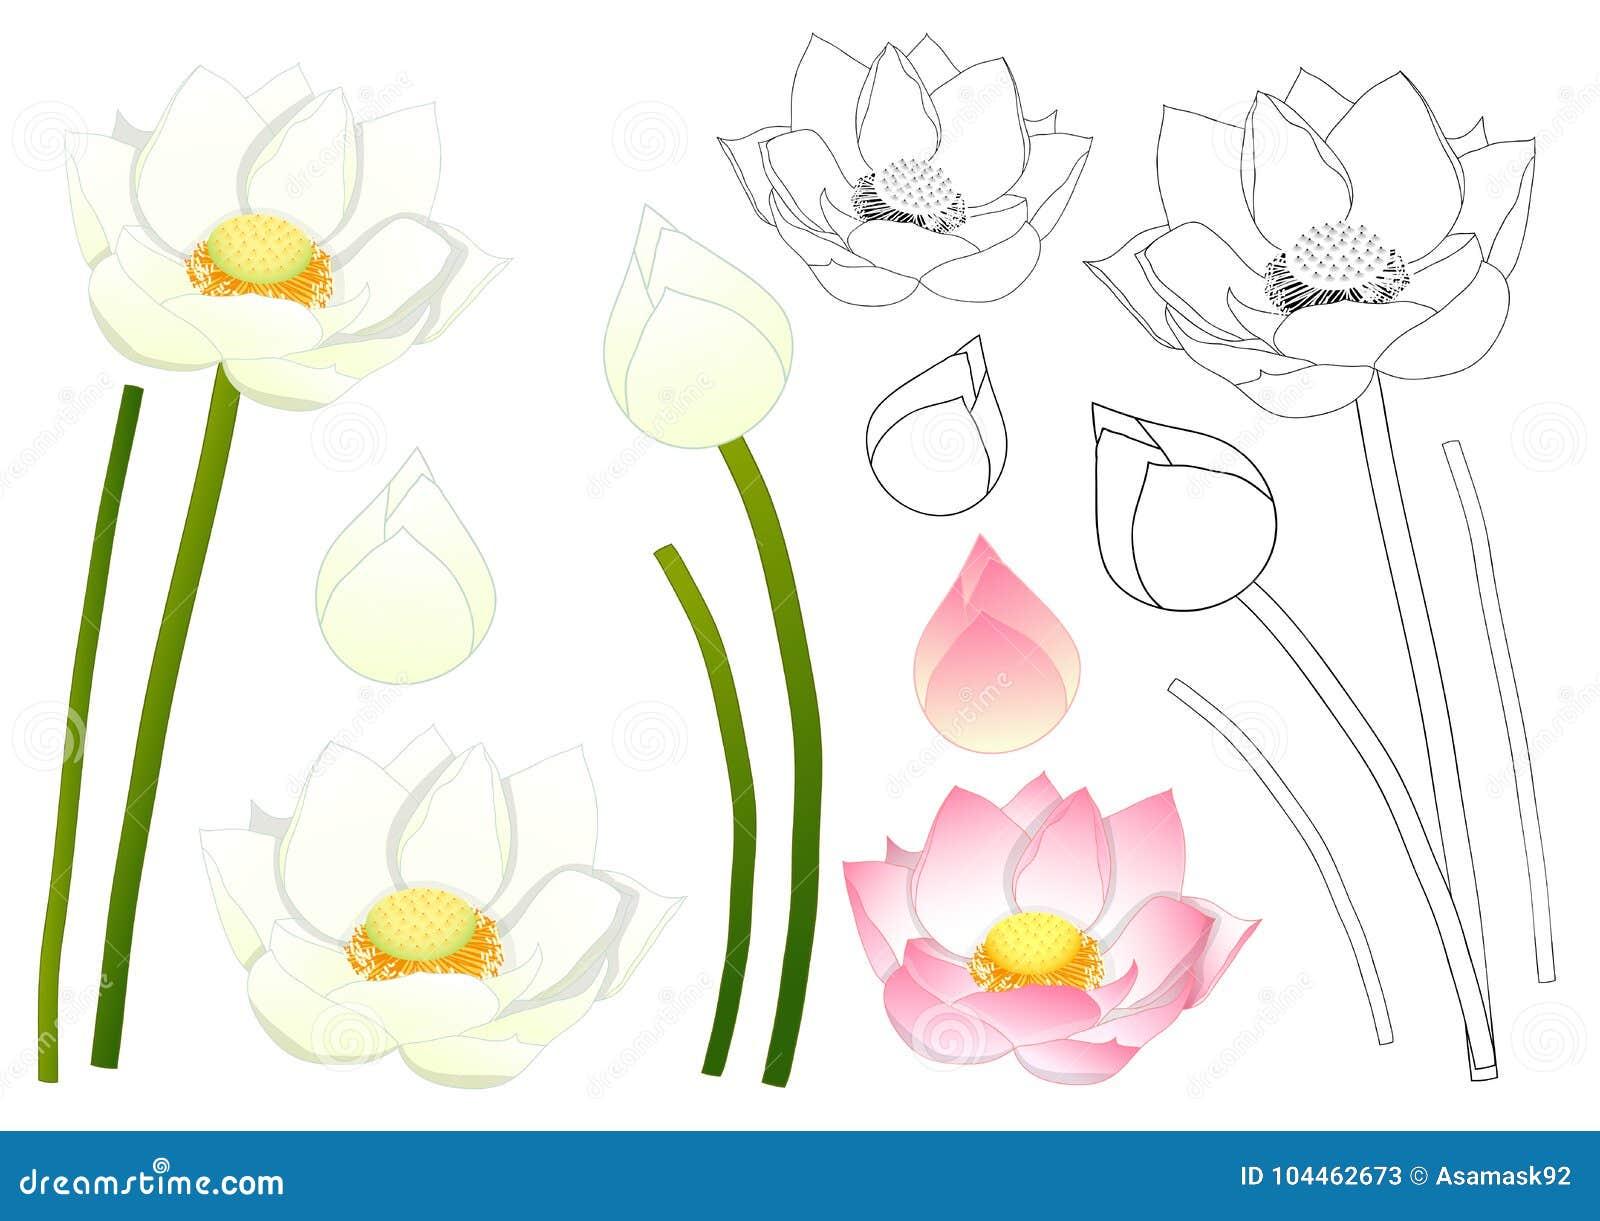 Nelumbo Nucifera Indian Lotus Sacred Lotus Bean Of India